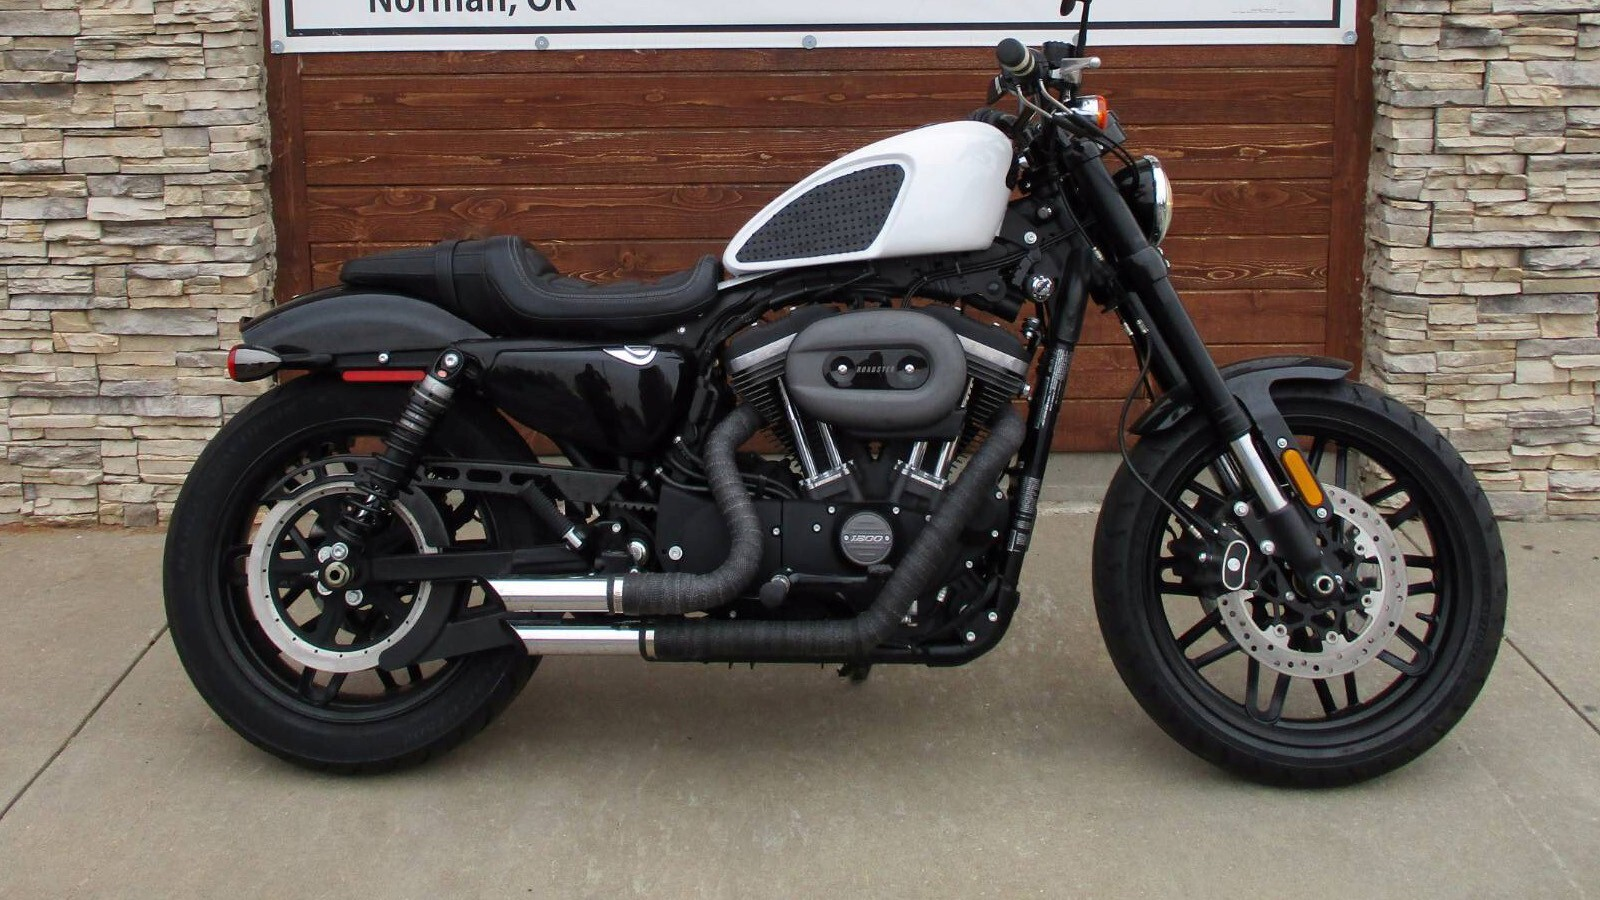 White Harley Davidson: Famous Harley Davidson Roadster White Bike